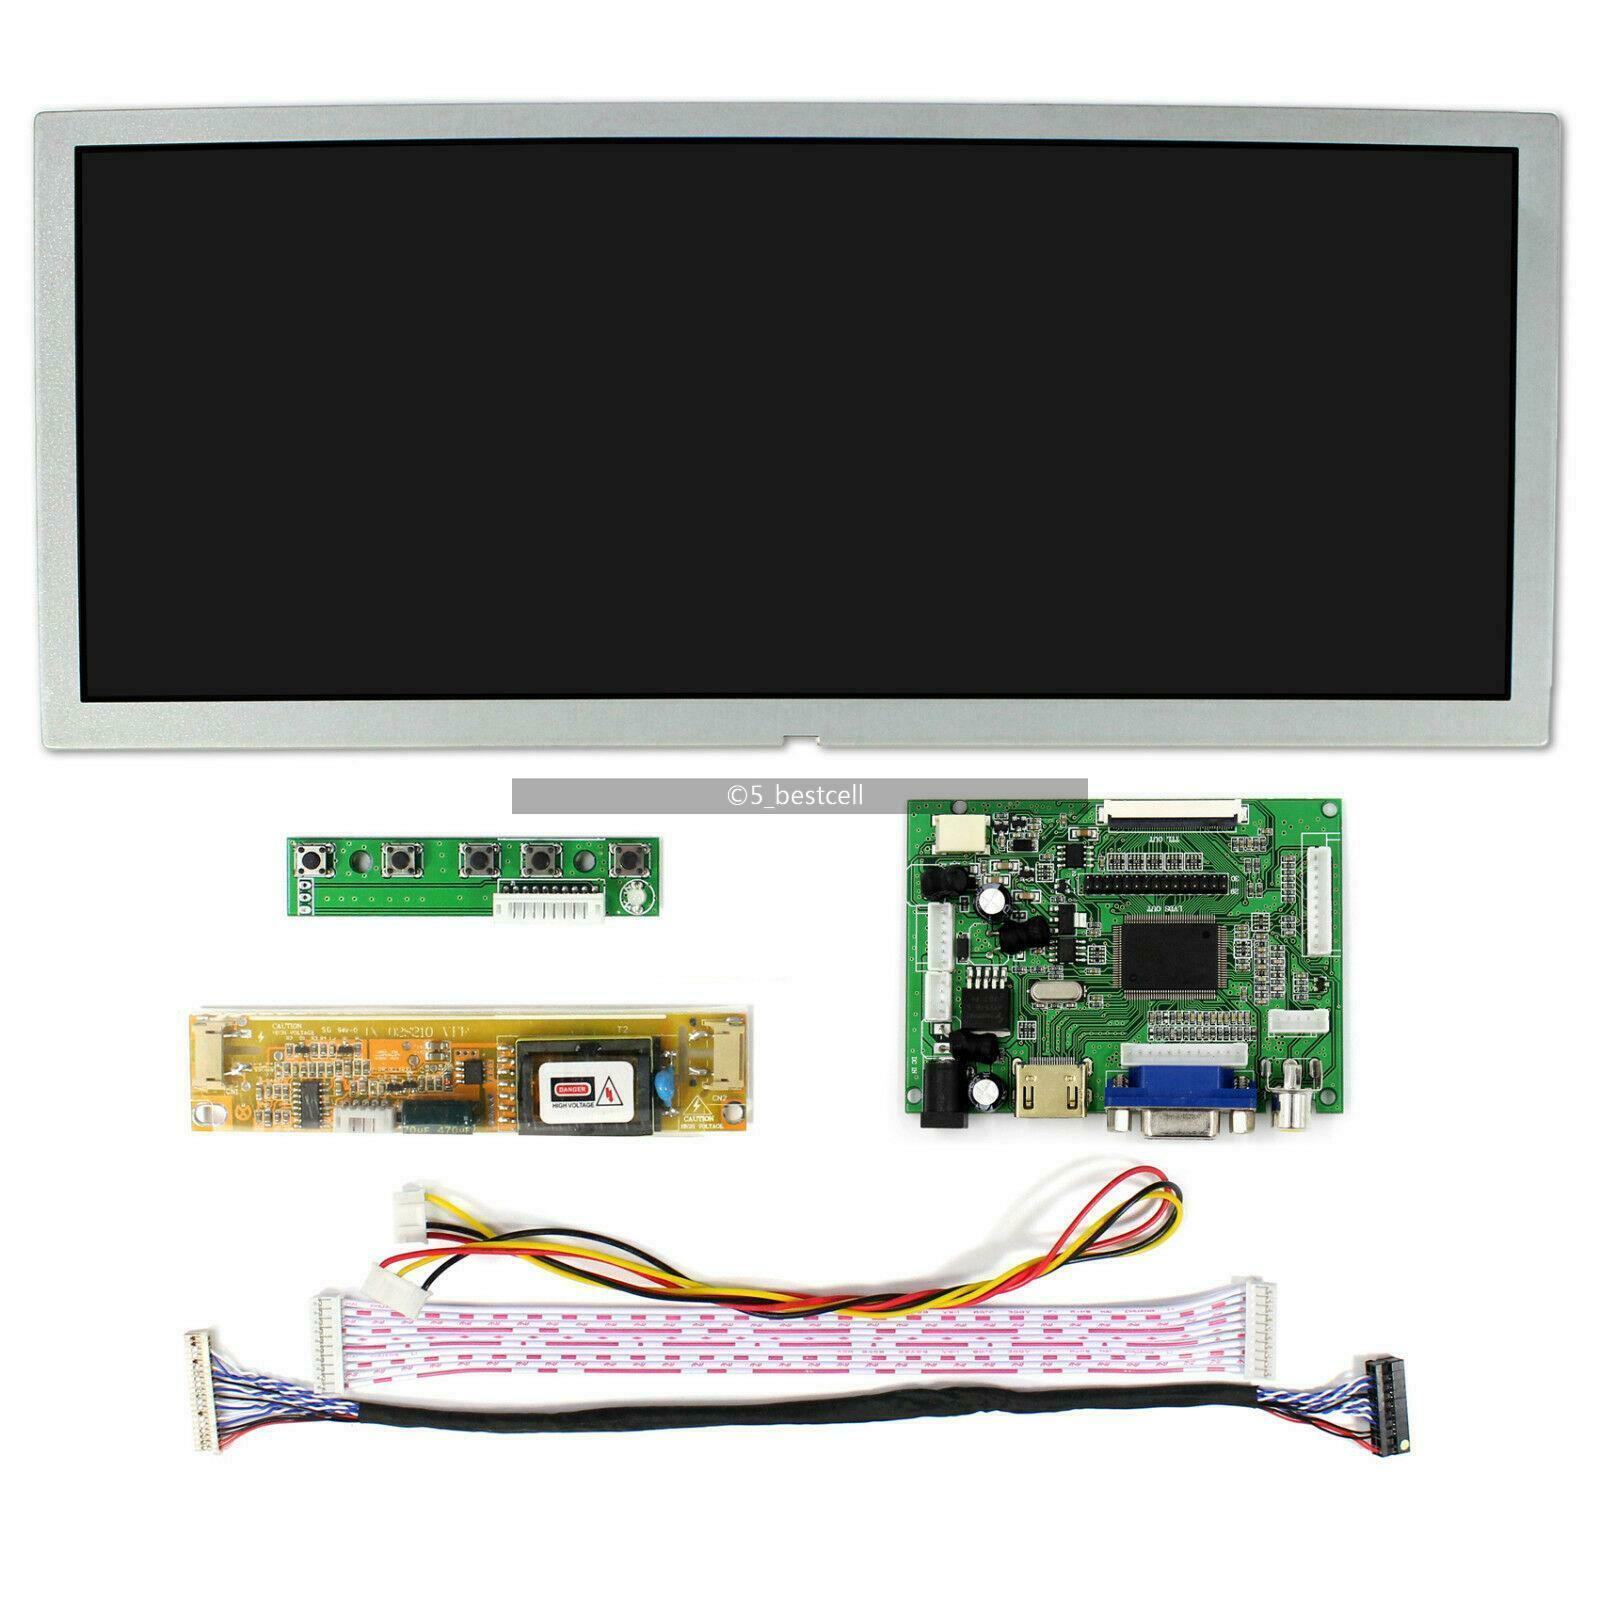 Latumab 12.3 Inch LCD Display Screen Monitor Driver Board Controller LQ123K1LG03 VS-TY2662-V1 HDMI VGA 2AV For Raspberry Pi 3